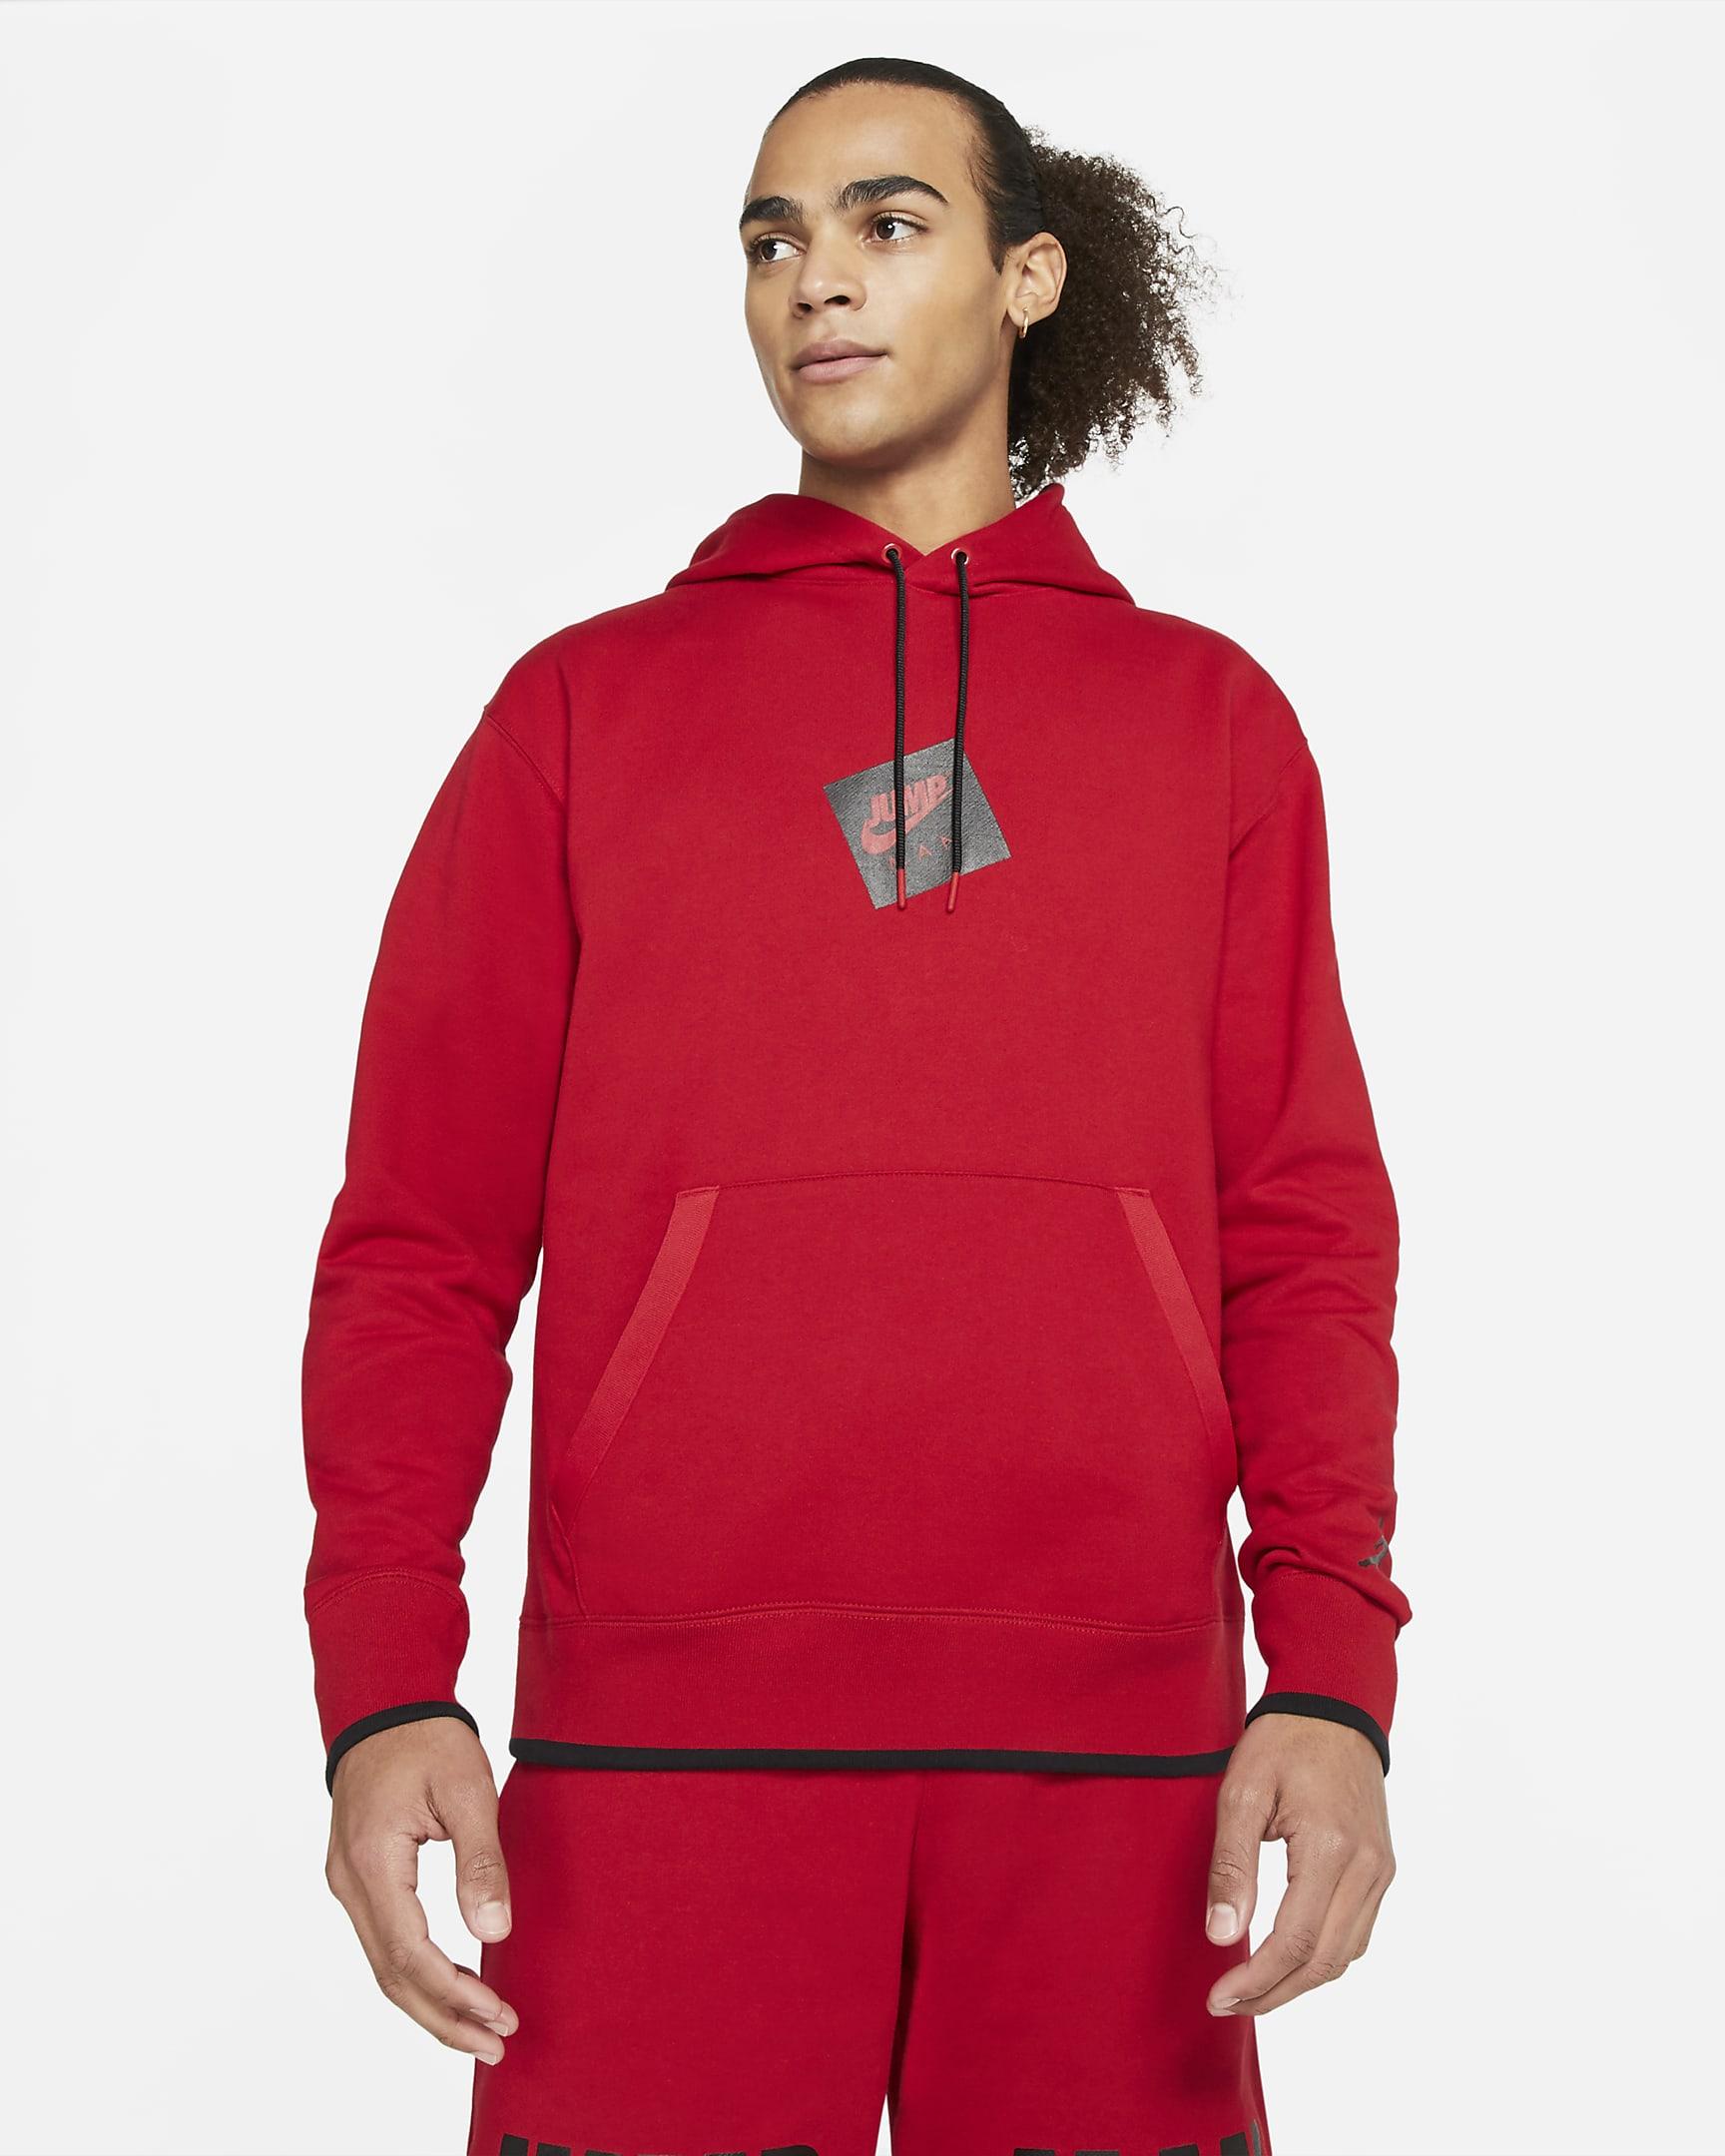 jordan-jumpman-classics-mens-printed-fleece-pullover-hoodie-hz0Q9t